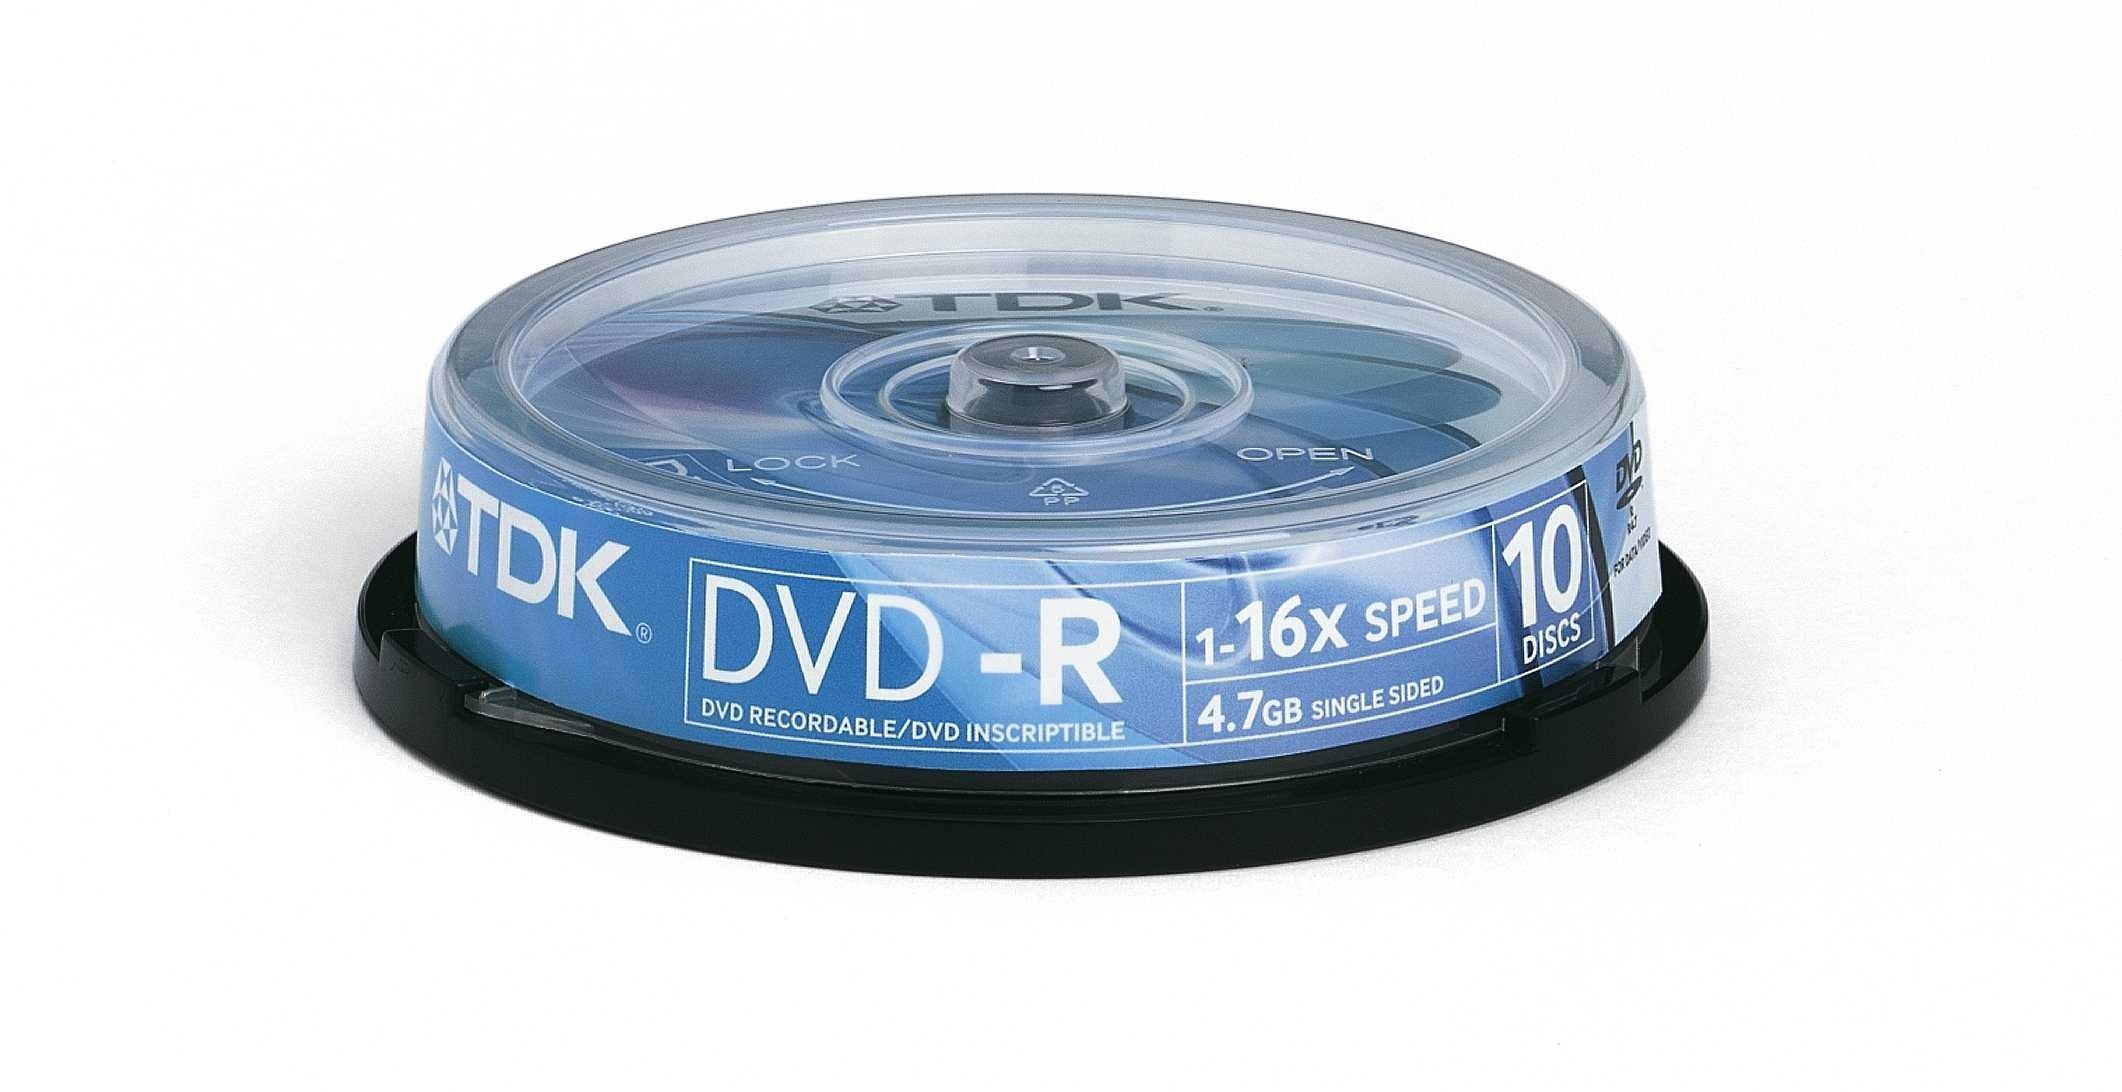 Tdk- - 10 X Dvd-r 4.7 Gb 16x - Spindle - Storage Media